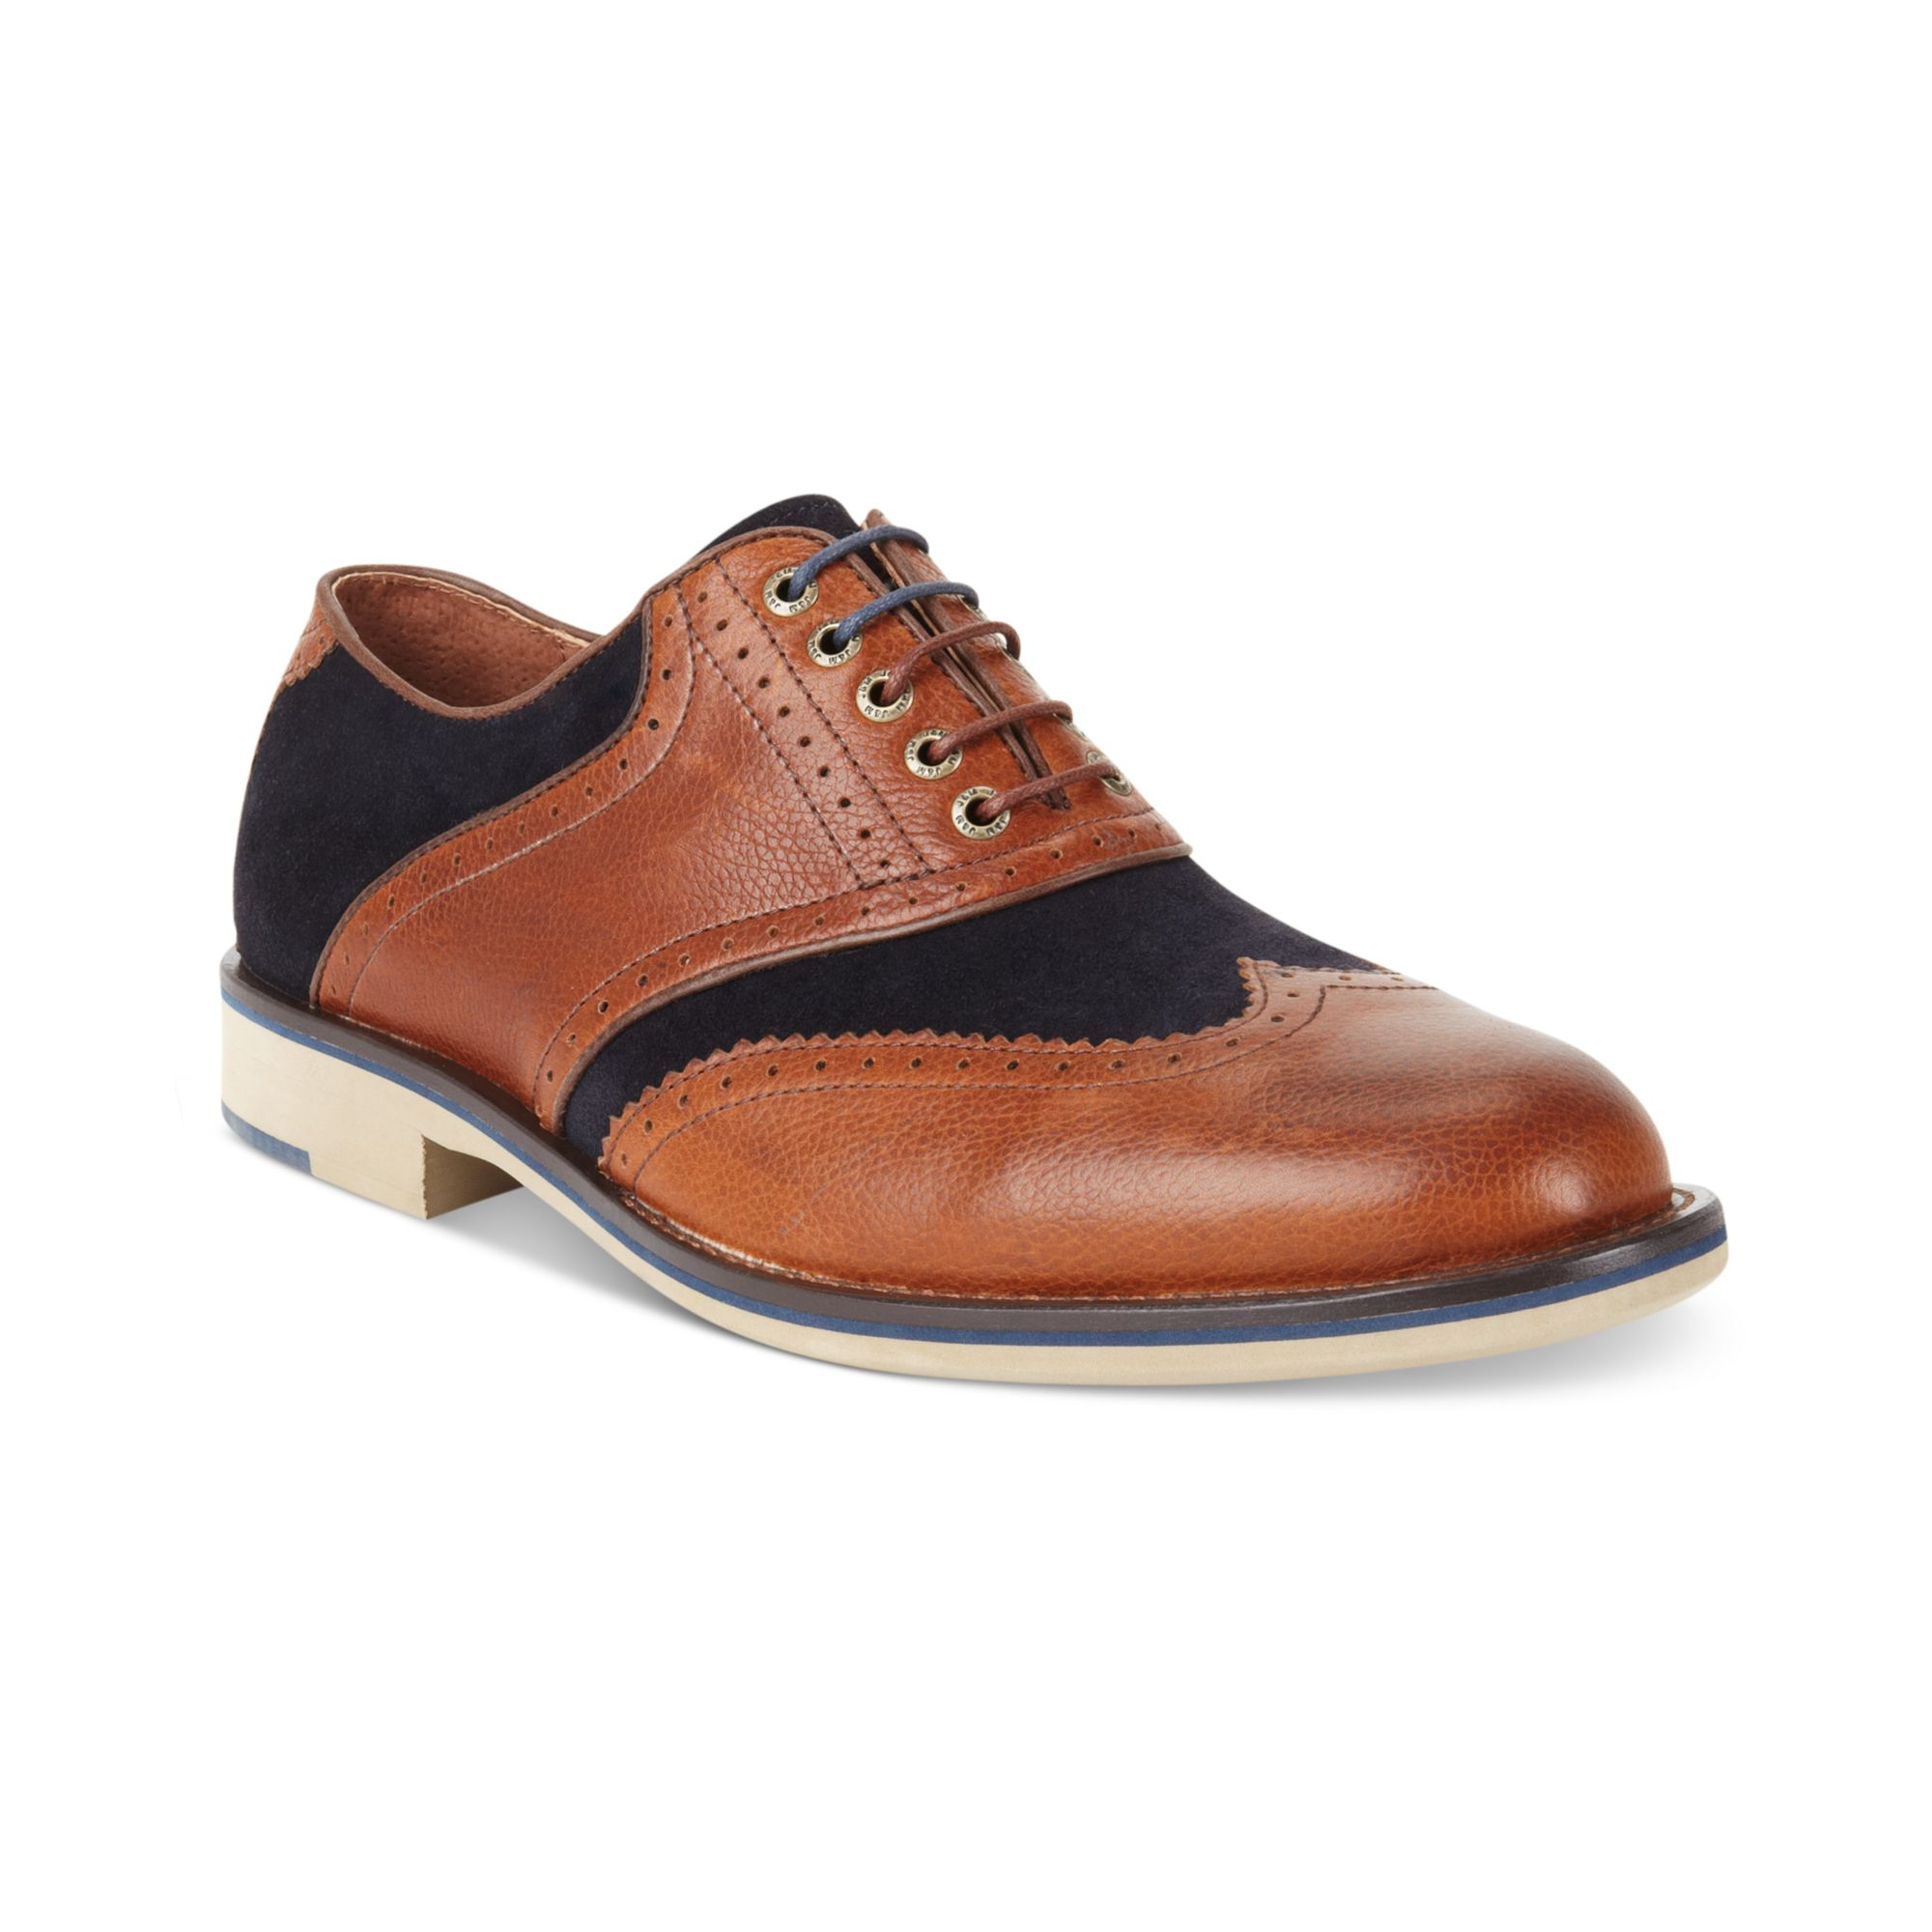 johnston murphy ellington wingtip laceup shoes in brown